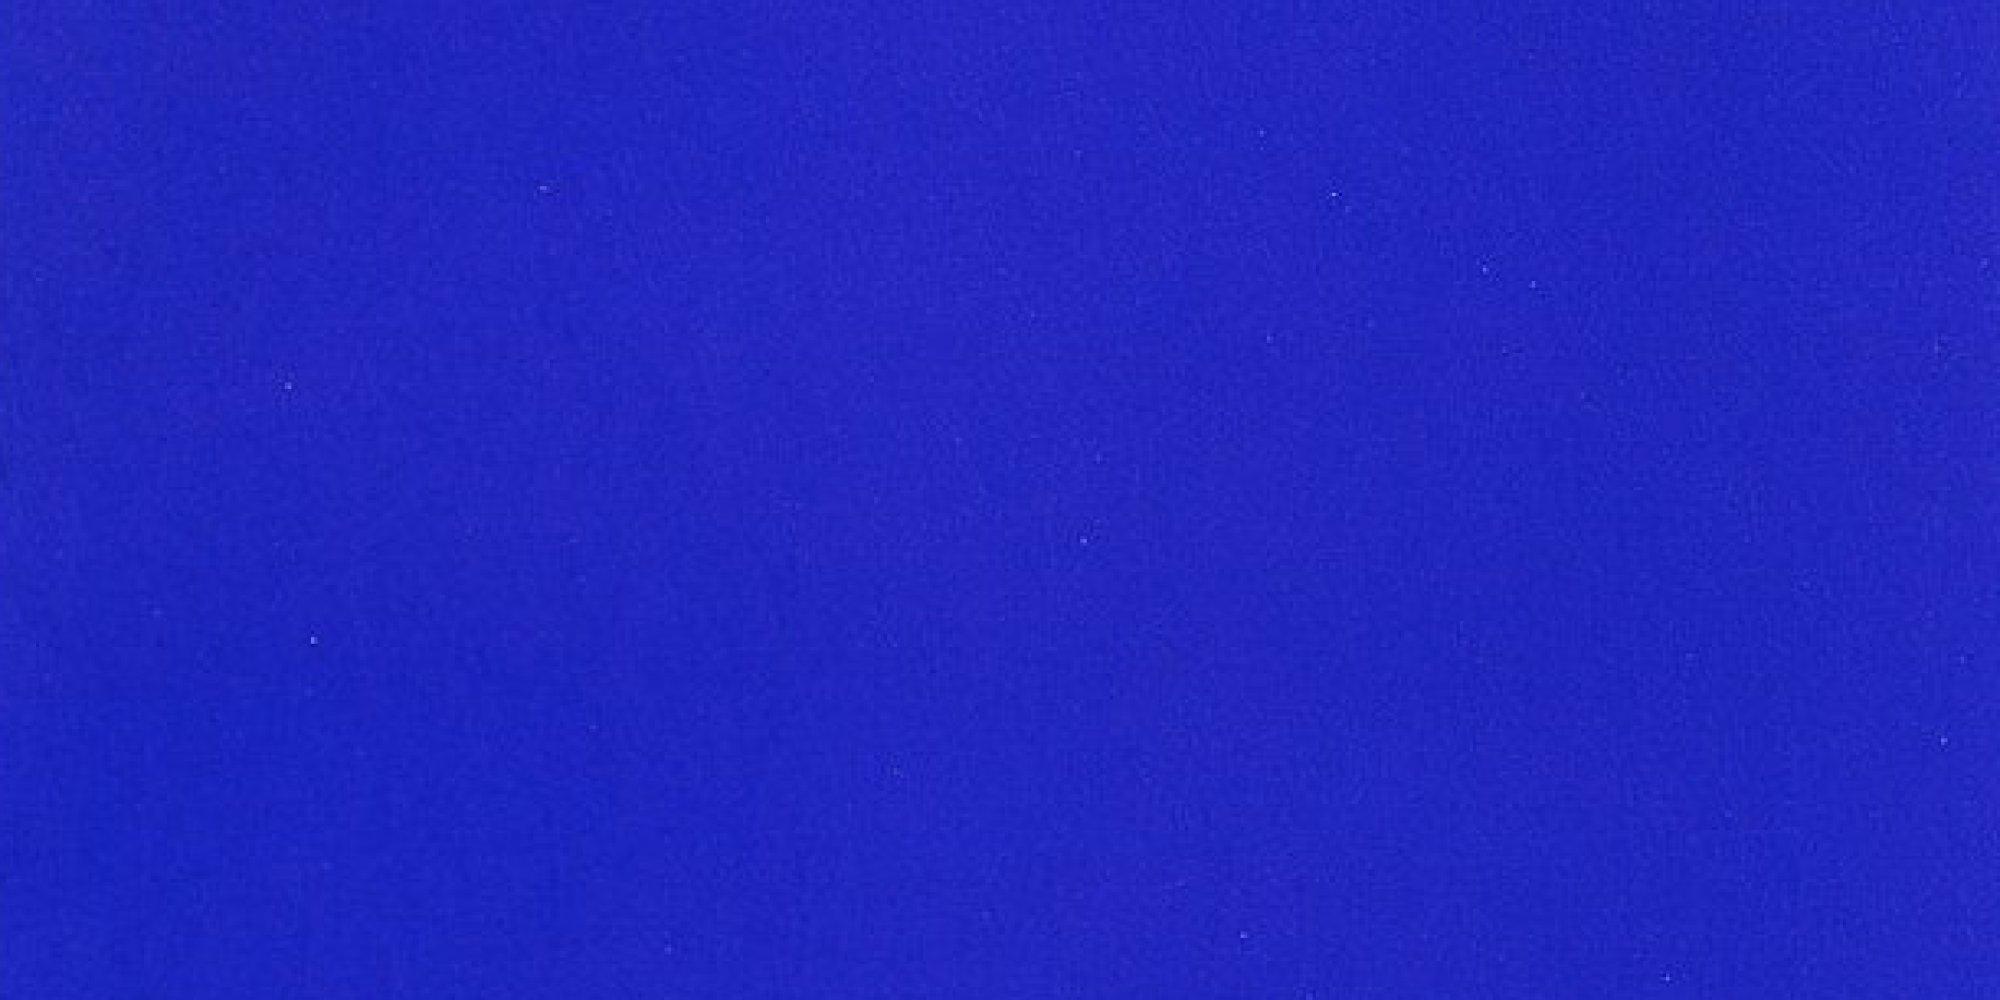 Las cosas azules tambi...